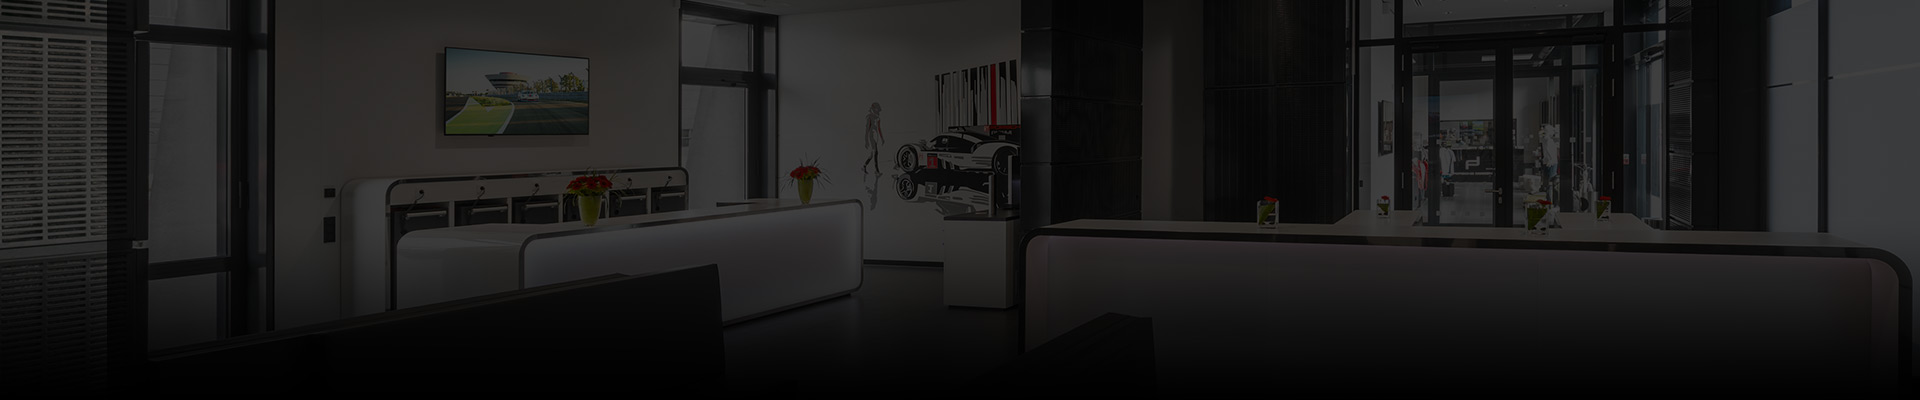 Porsche 718 GTS 车型 - 更多信息